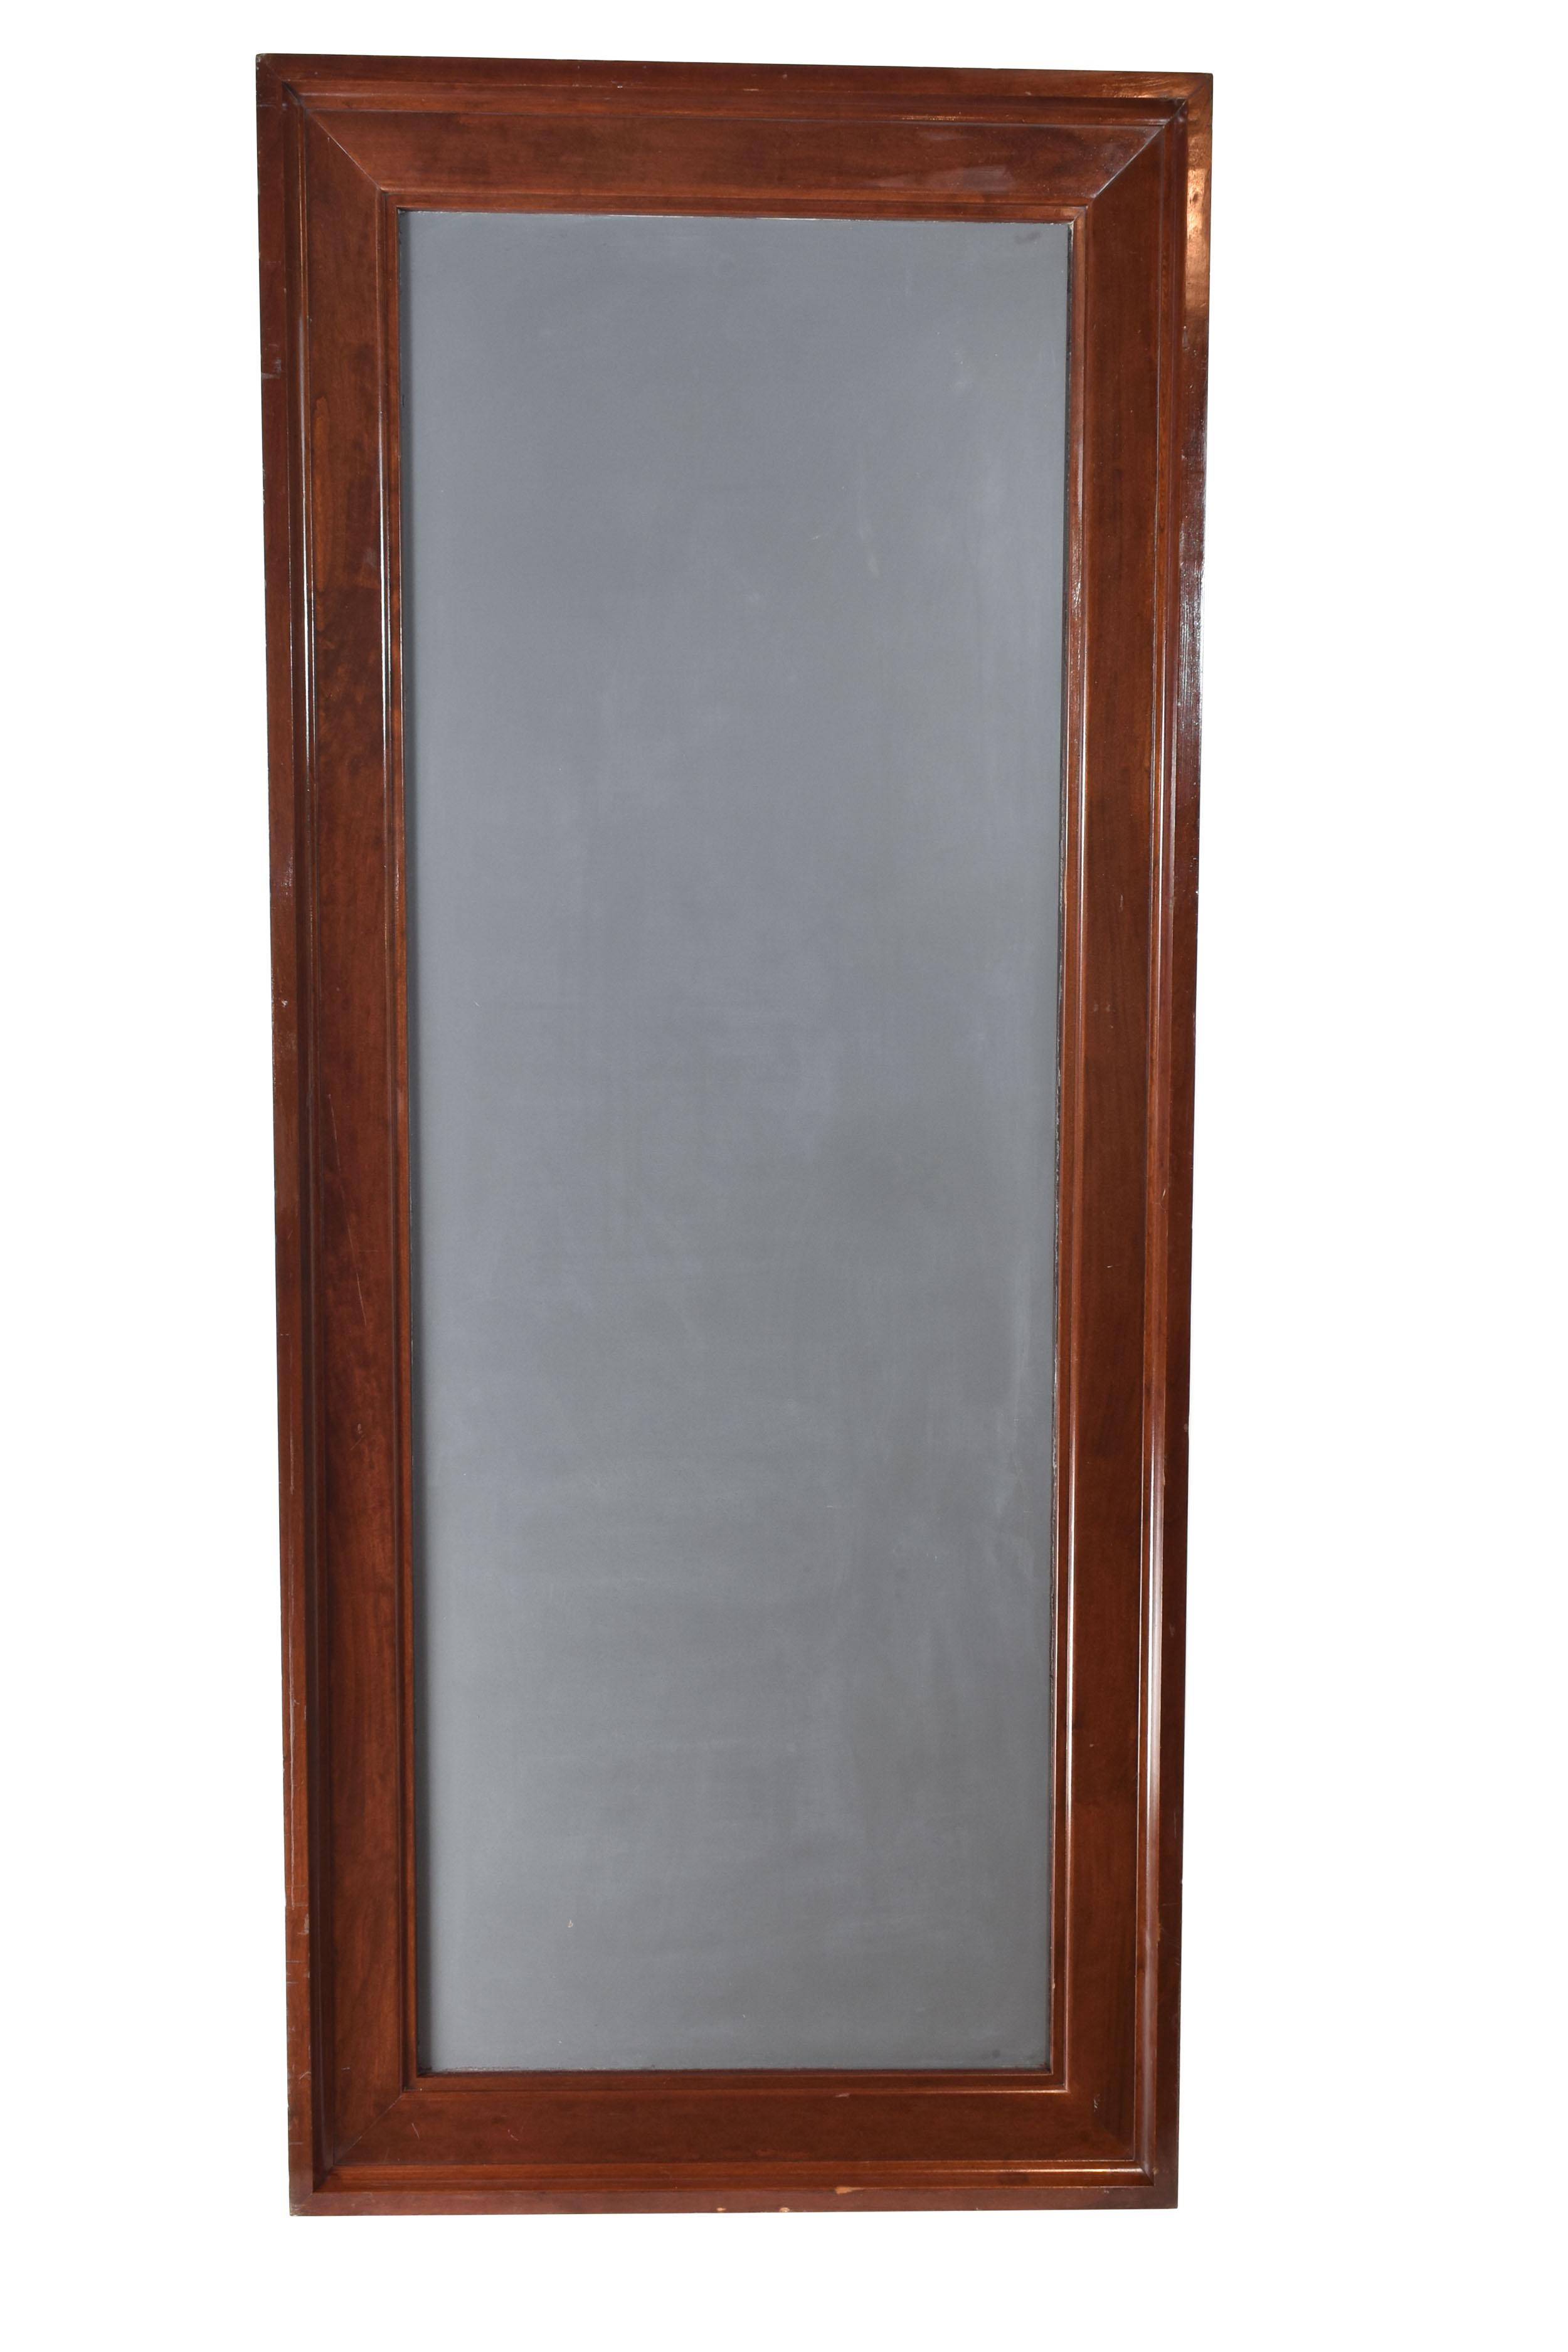 48048 rectangle chalkboard.jpg